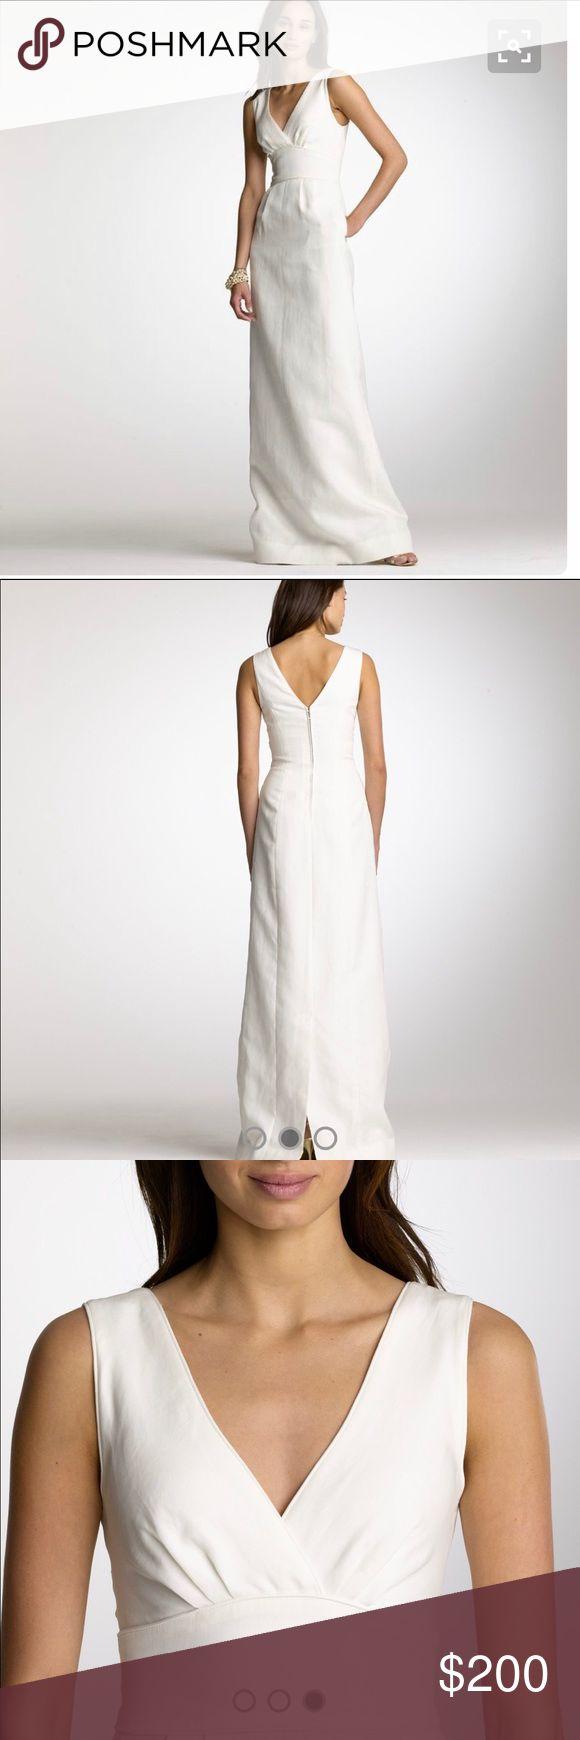 Selling this J Crew Alexa wedding dress on Poshmark! My username is: dlouisey. #shopmycloset #poshmark #fashion #shopping #style #forsale #j crew #Dresses & Skirts